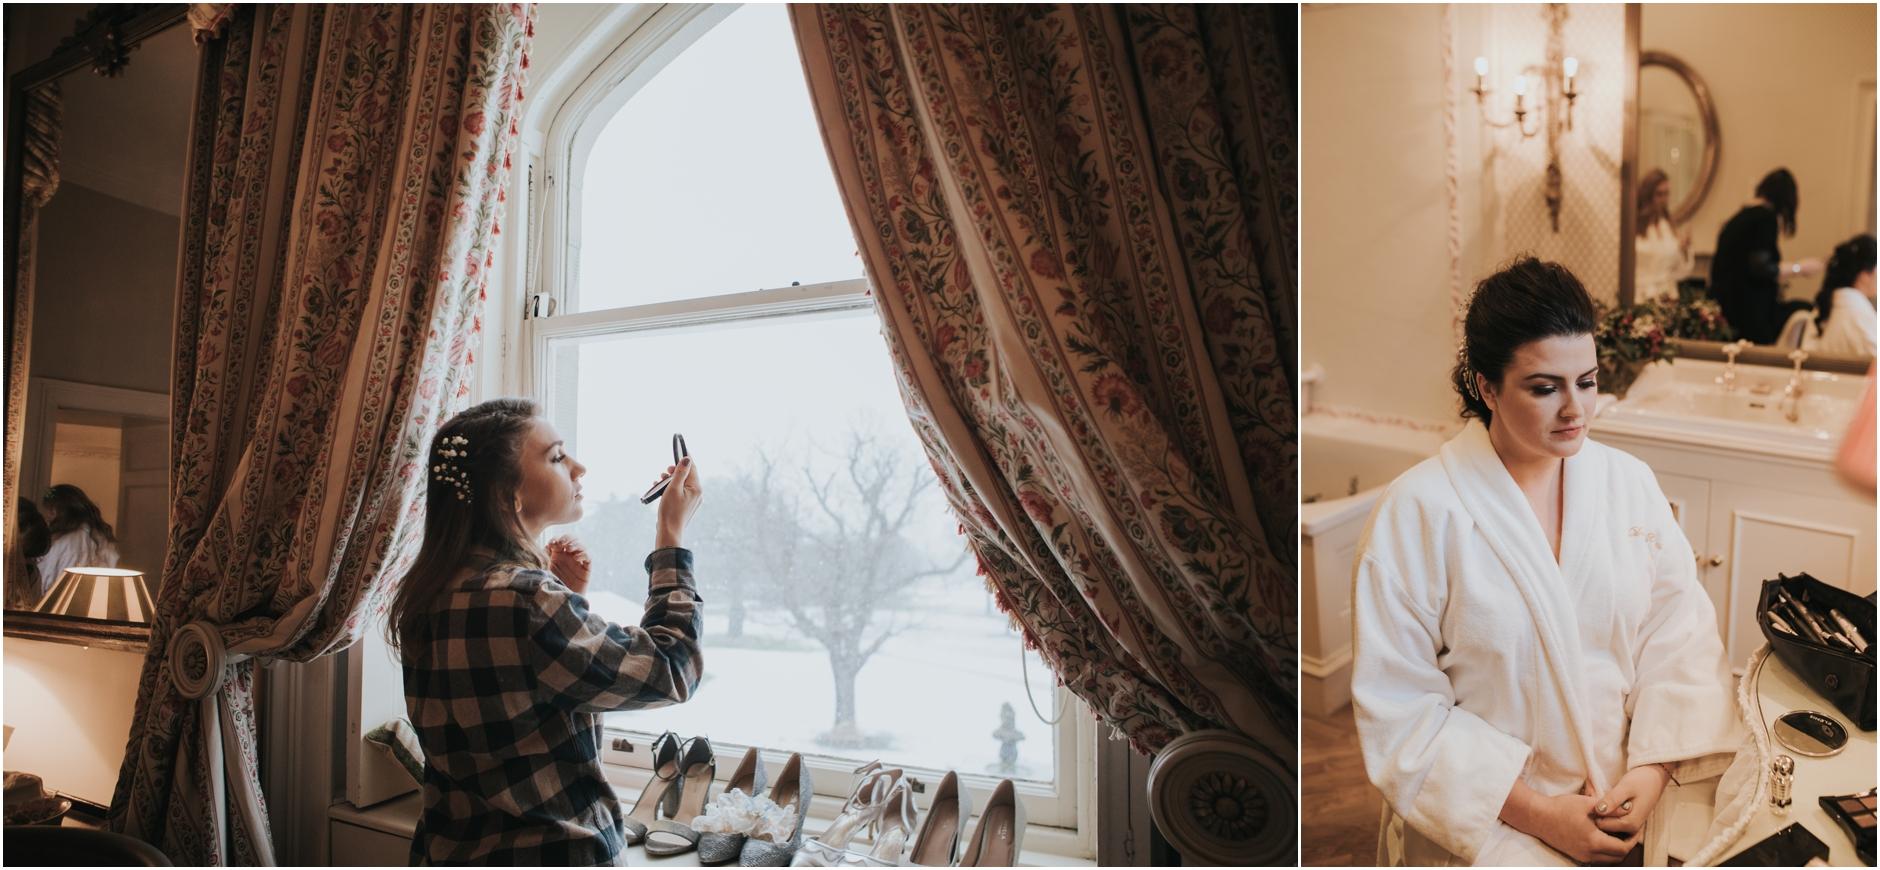 dundas castle bridesmaid putting on make up at mirror